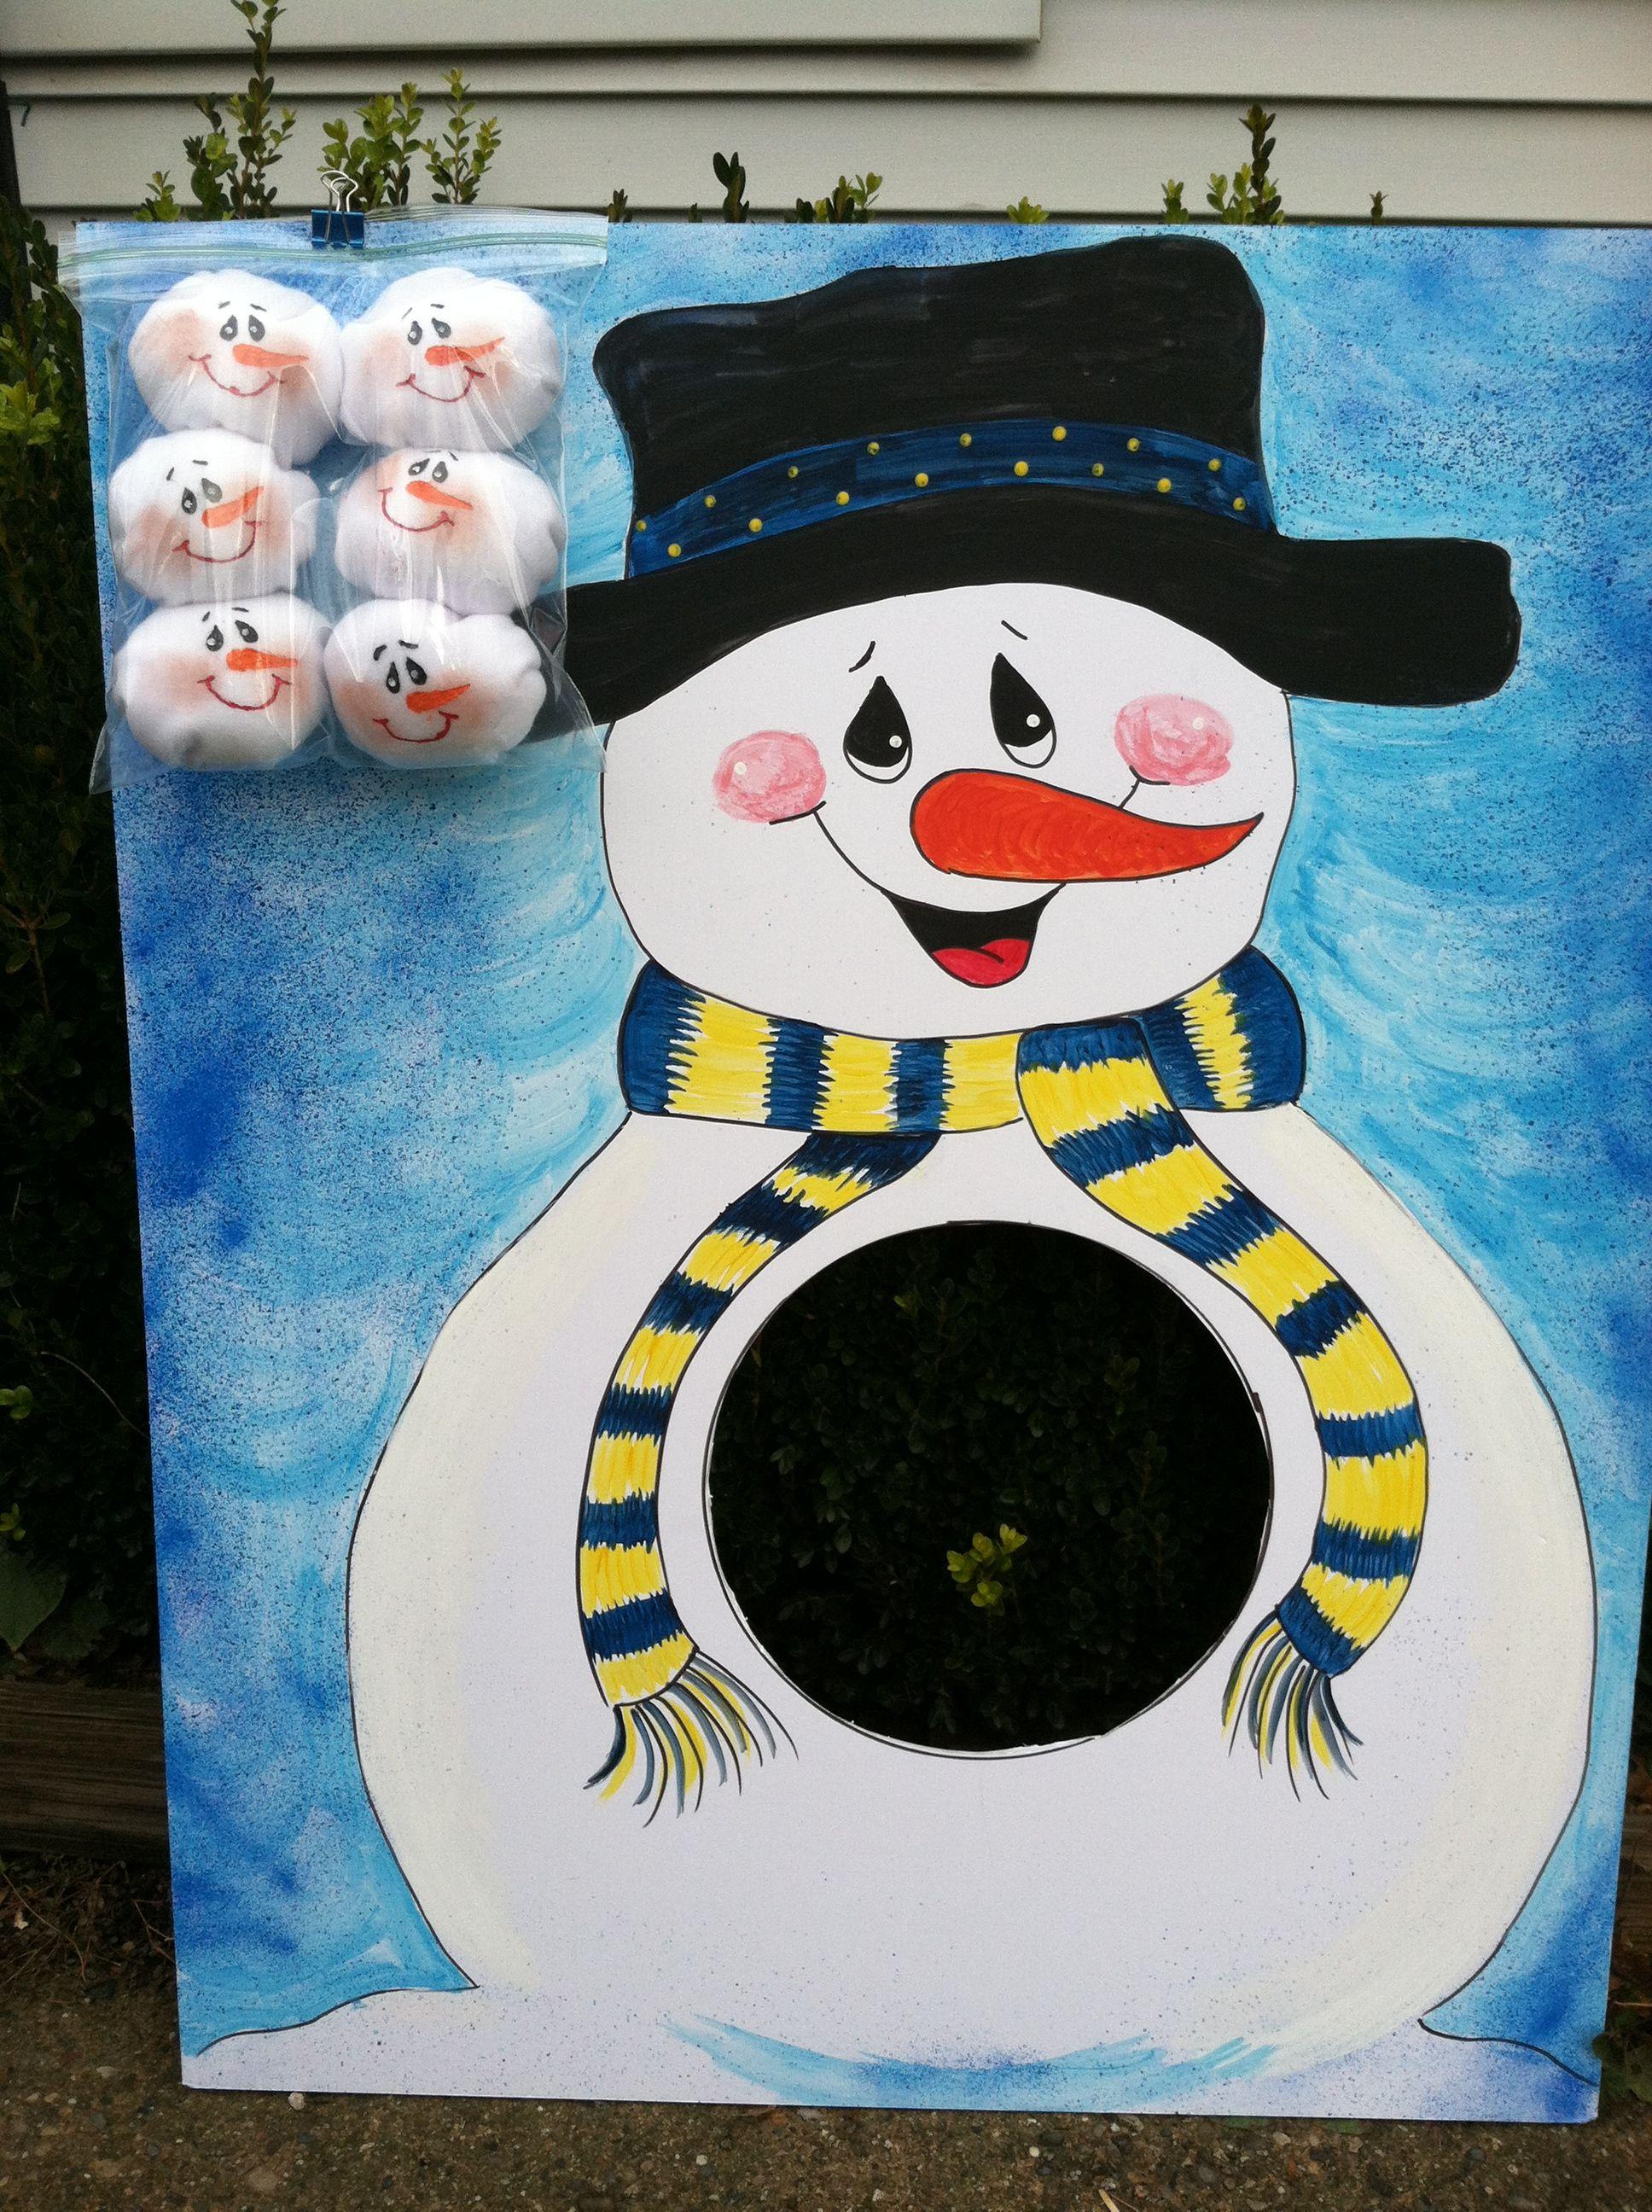 Snowball Toss Game Snowman Made From Foam Core Board